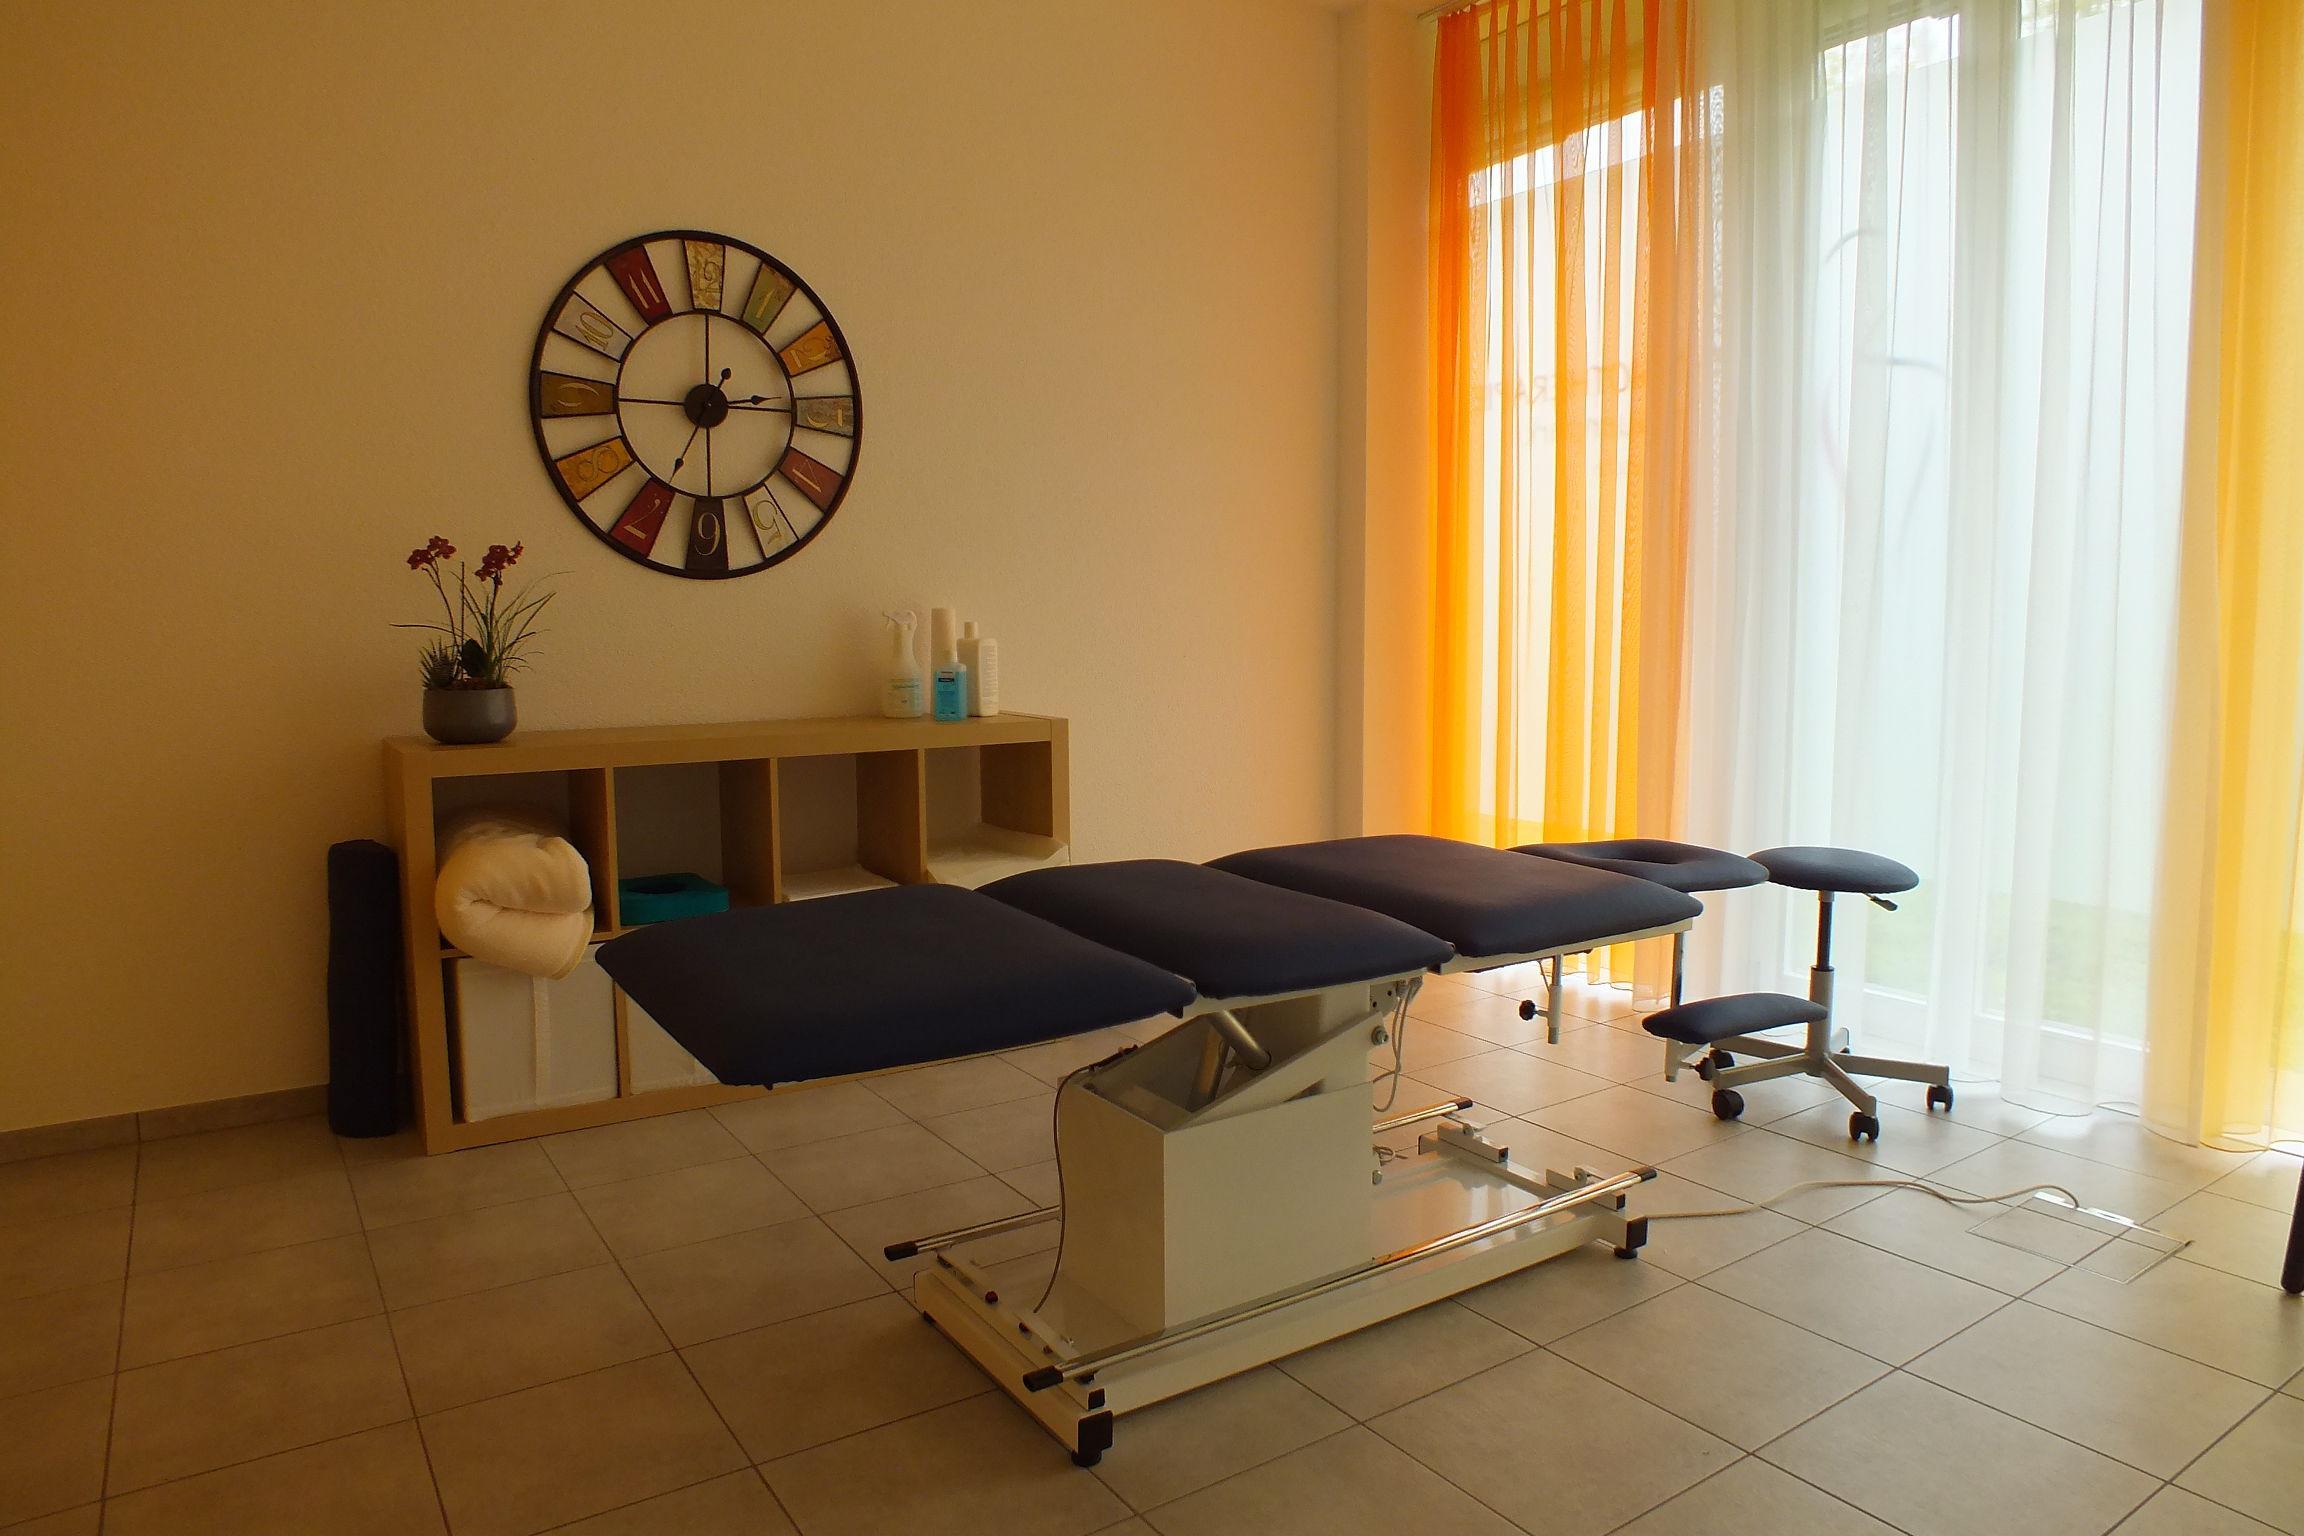 Physiotherapie im Auenpark